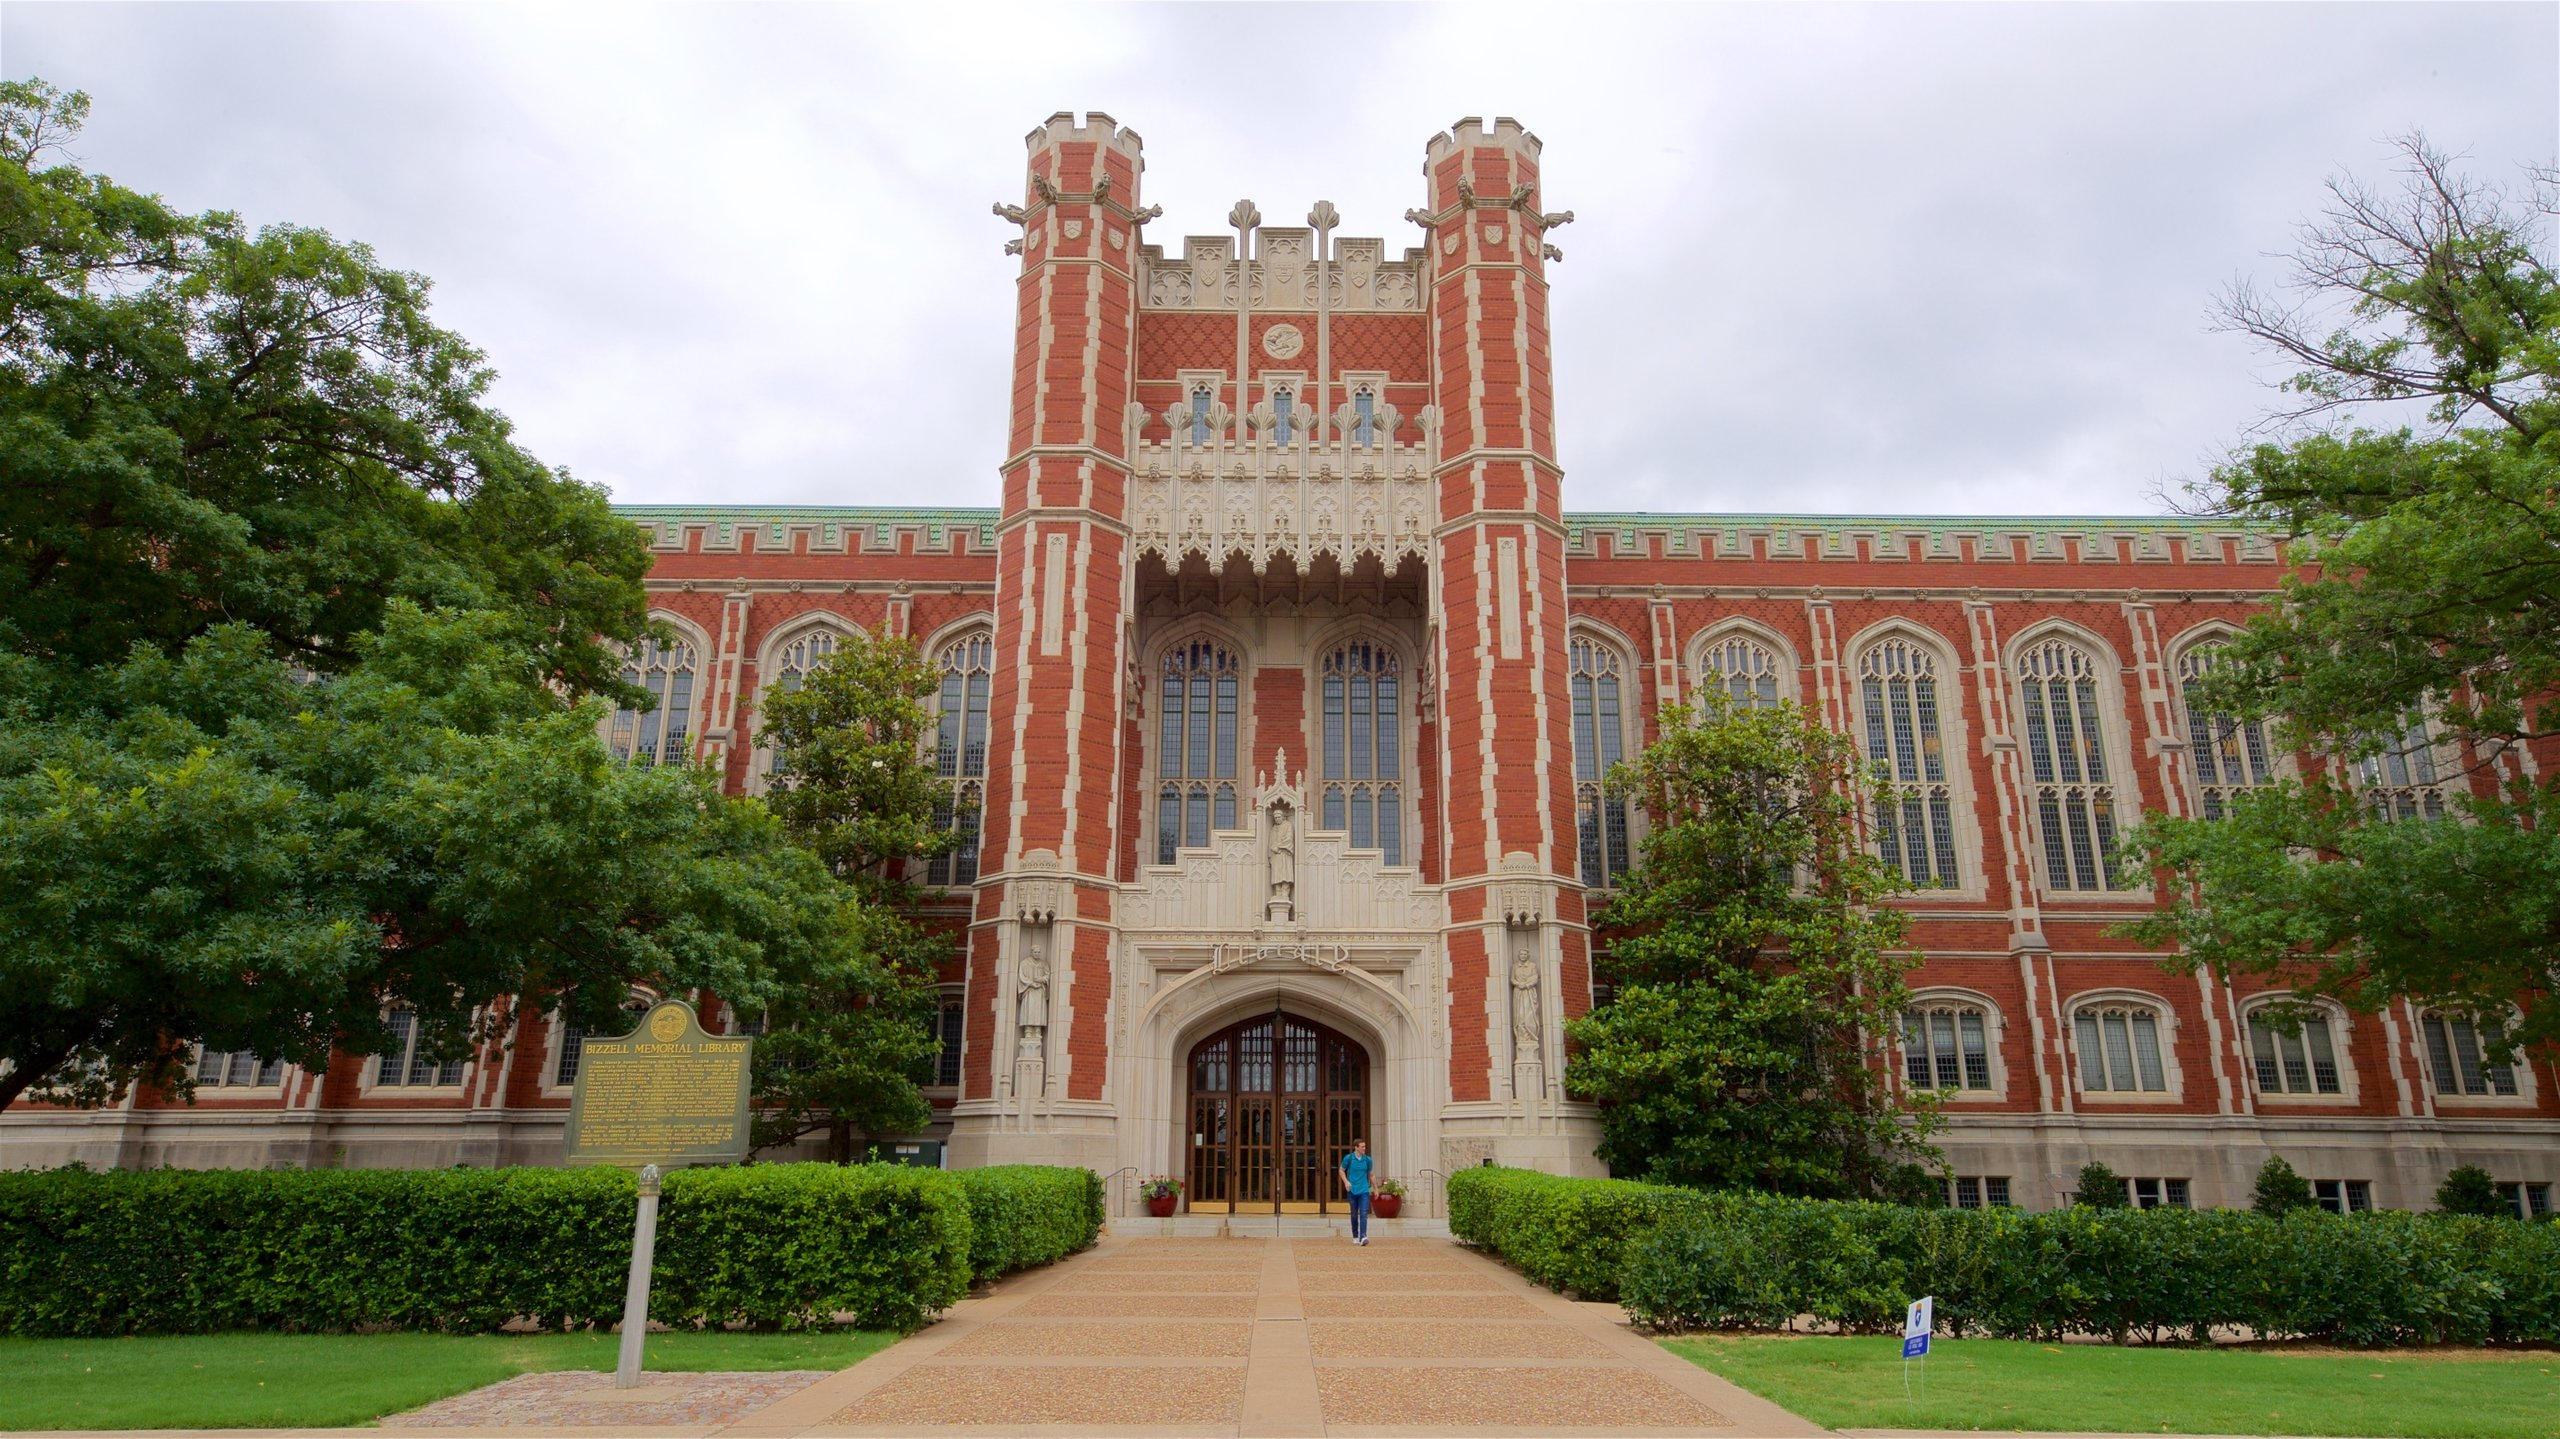 Norman, Oklahoma, United States of America